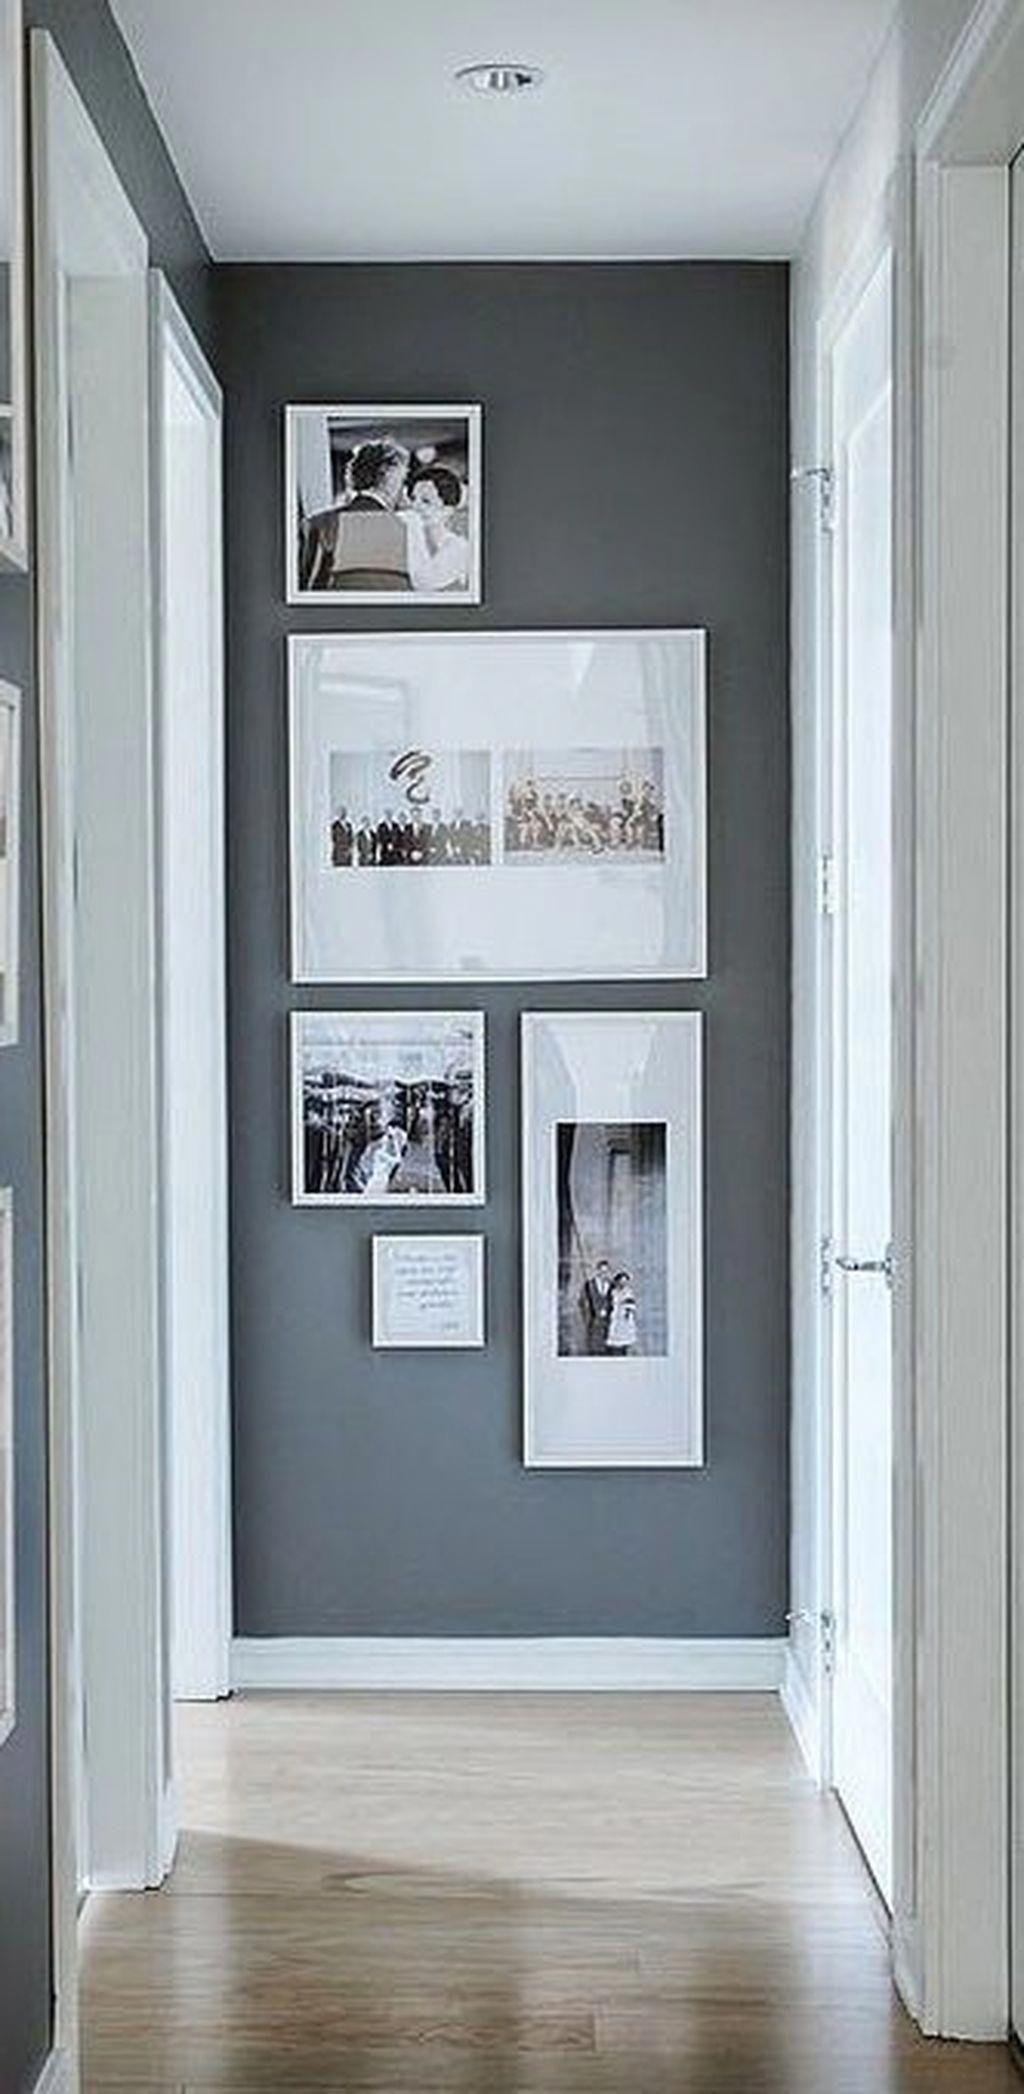 Nice beautiful gallery wall decor ideas to show photos